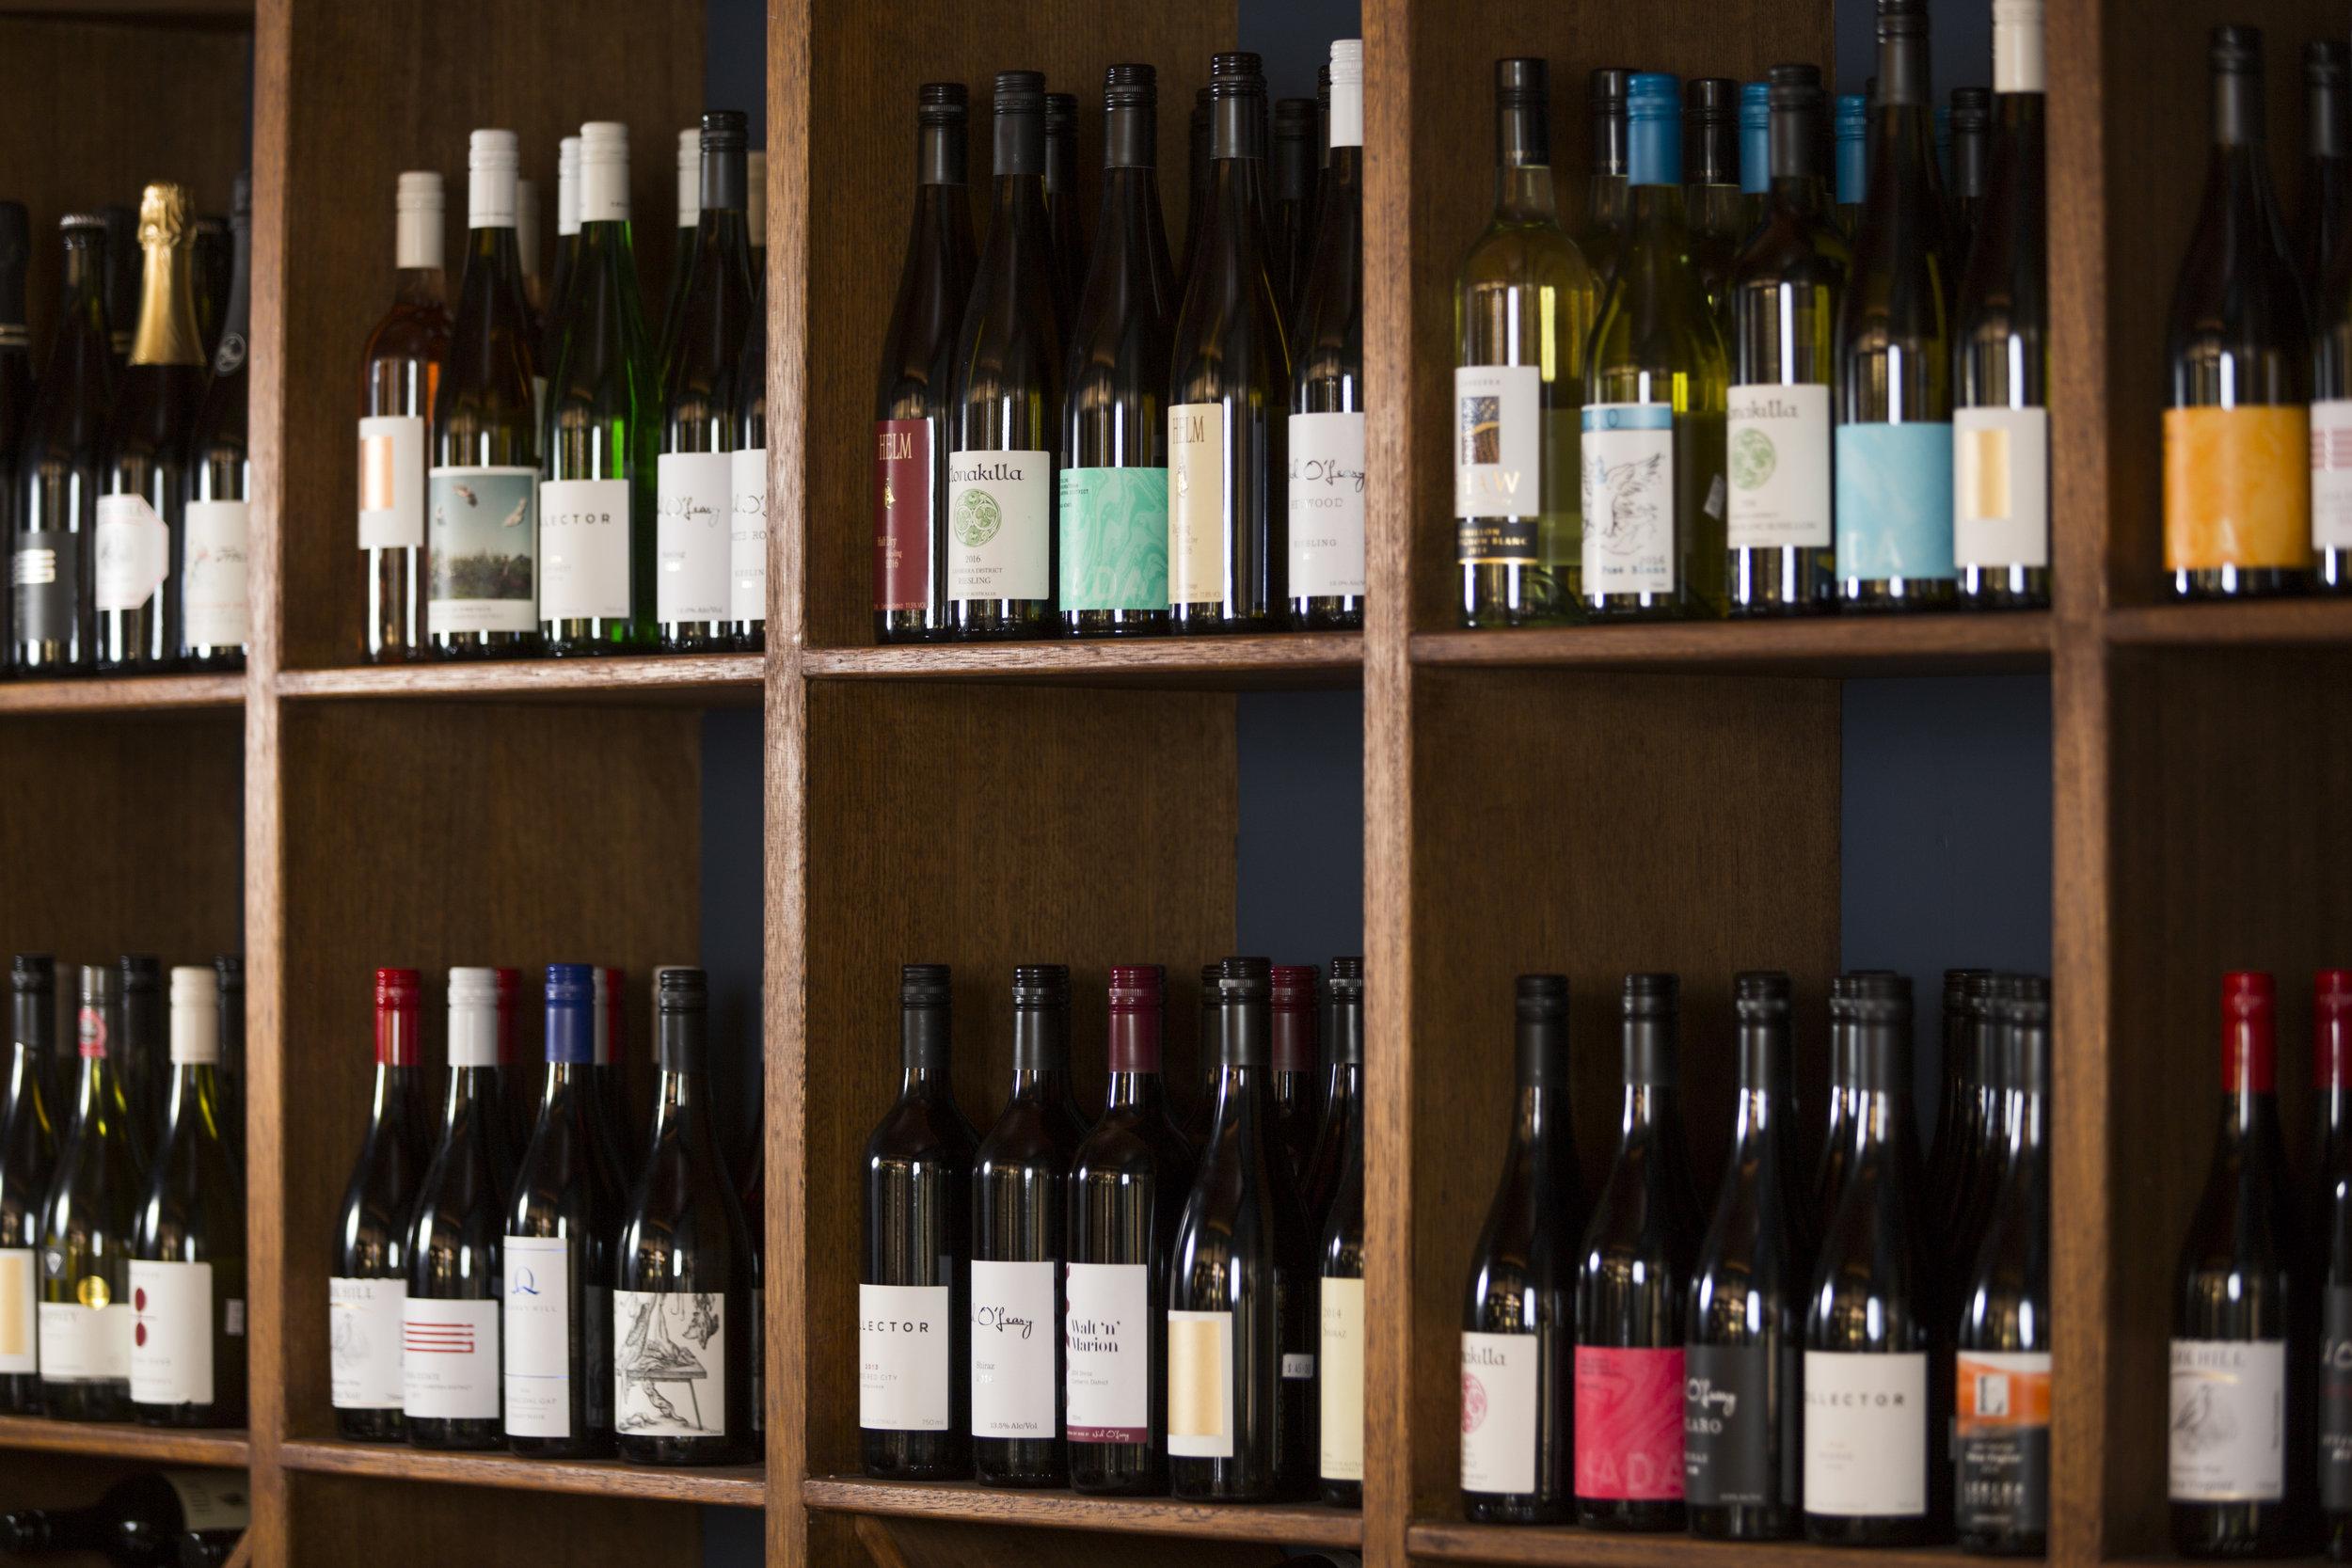 [171012-171012] The Canberra Wine House (Sean Davey) _0052 [Original].jpg